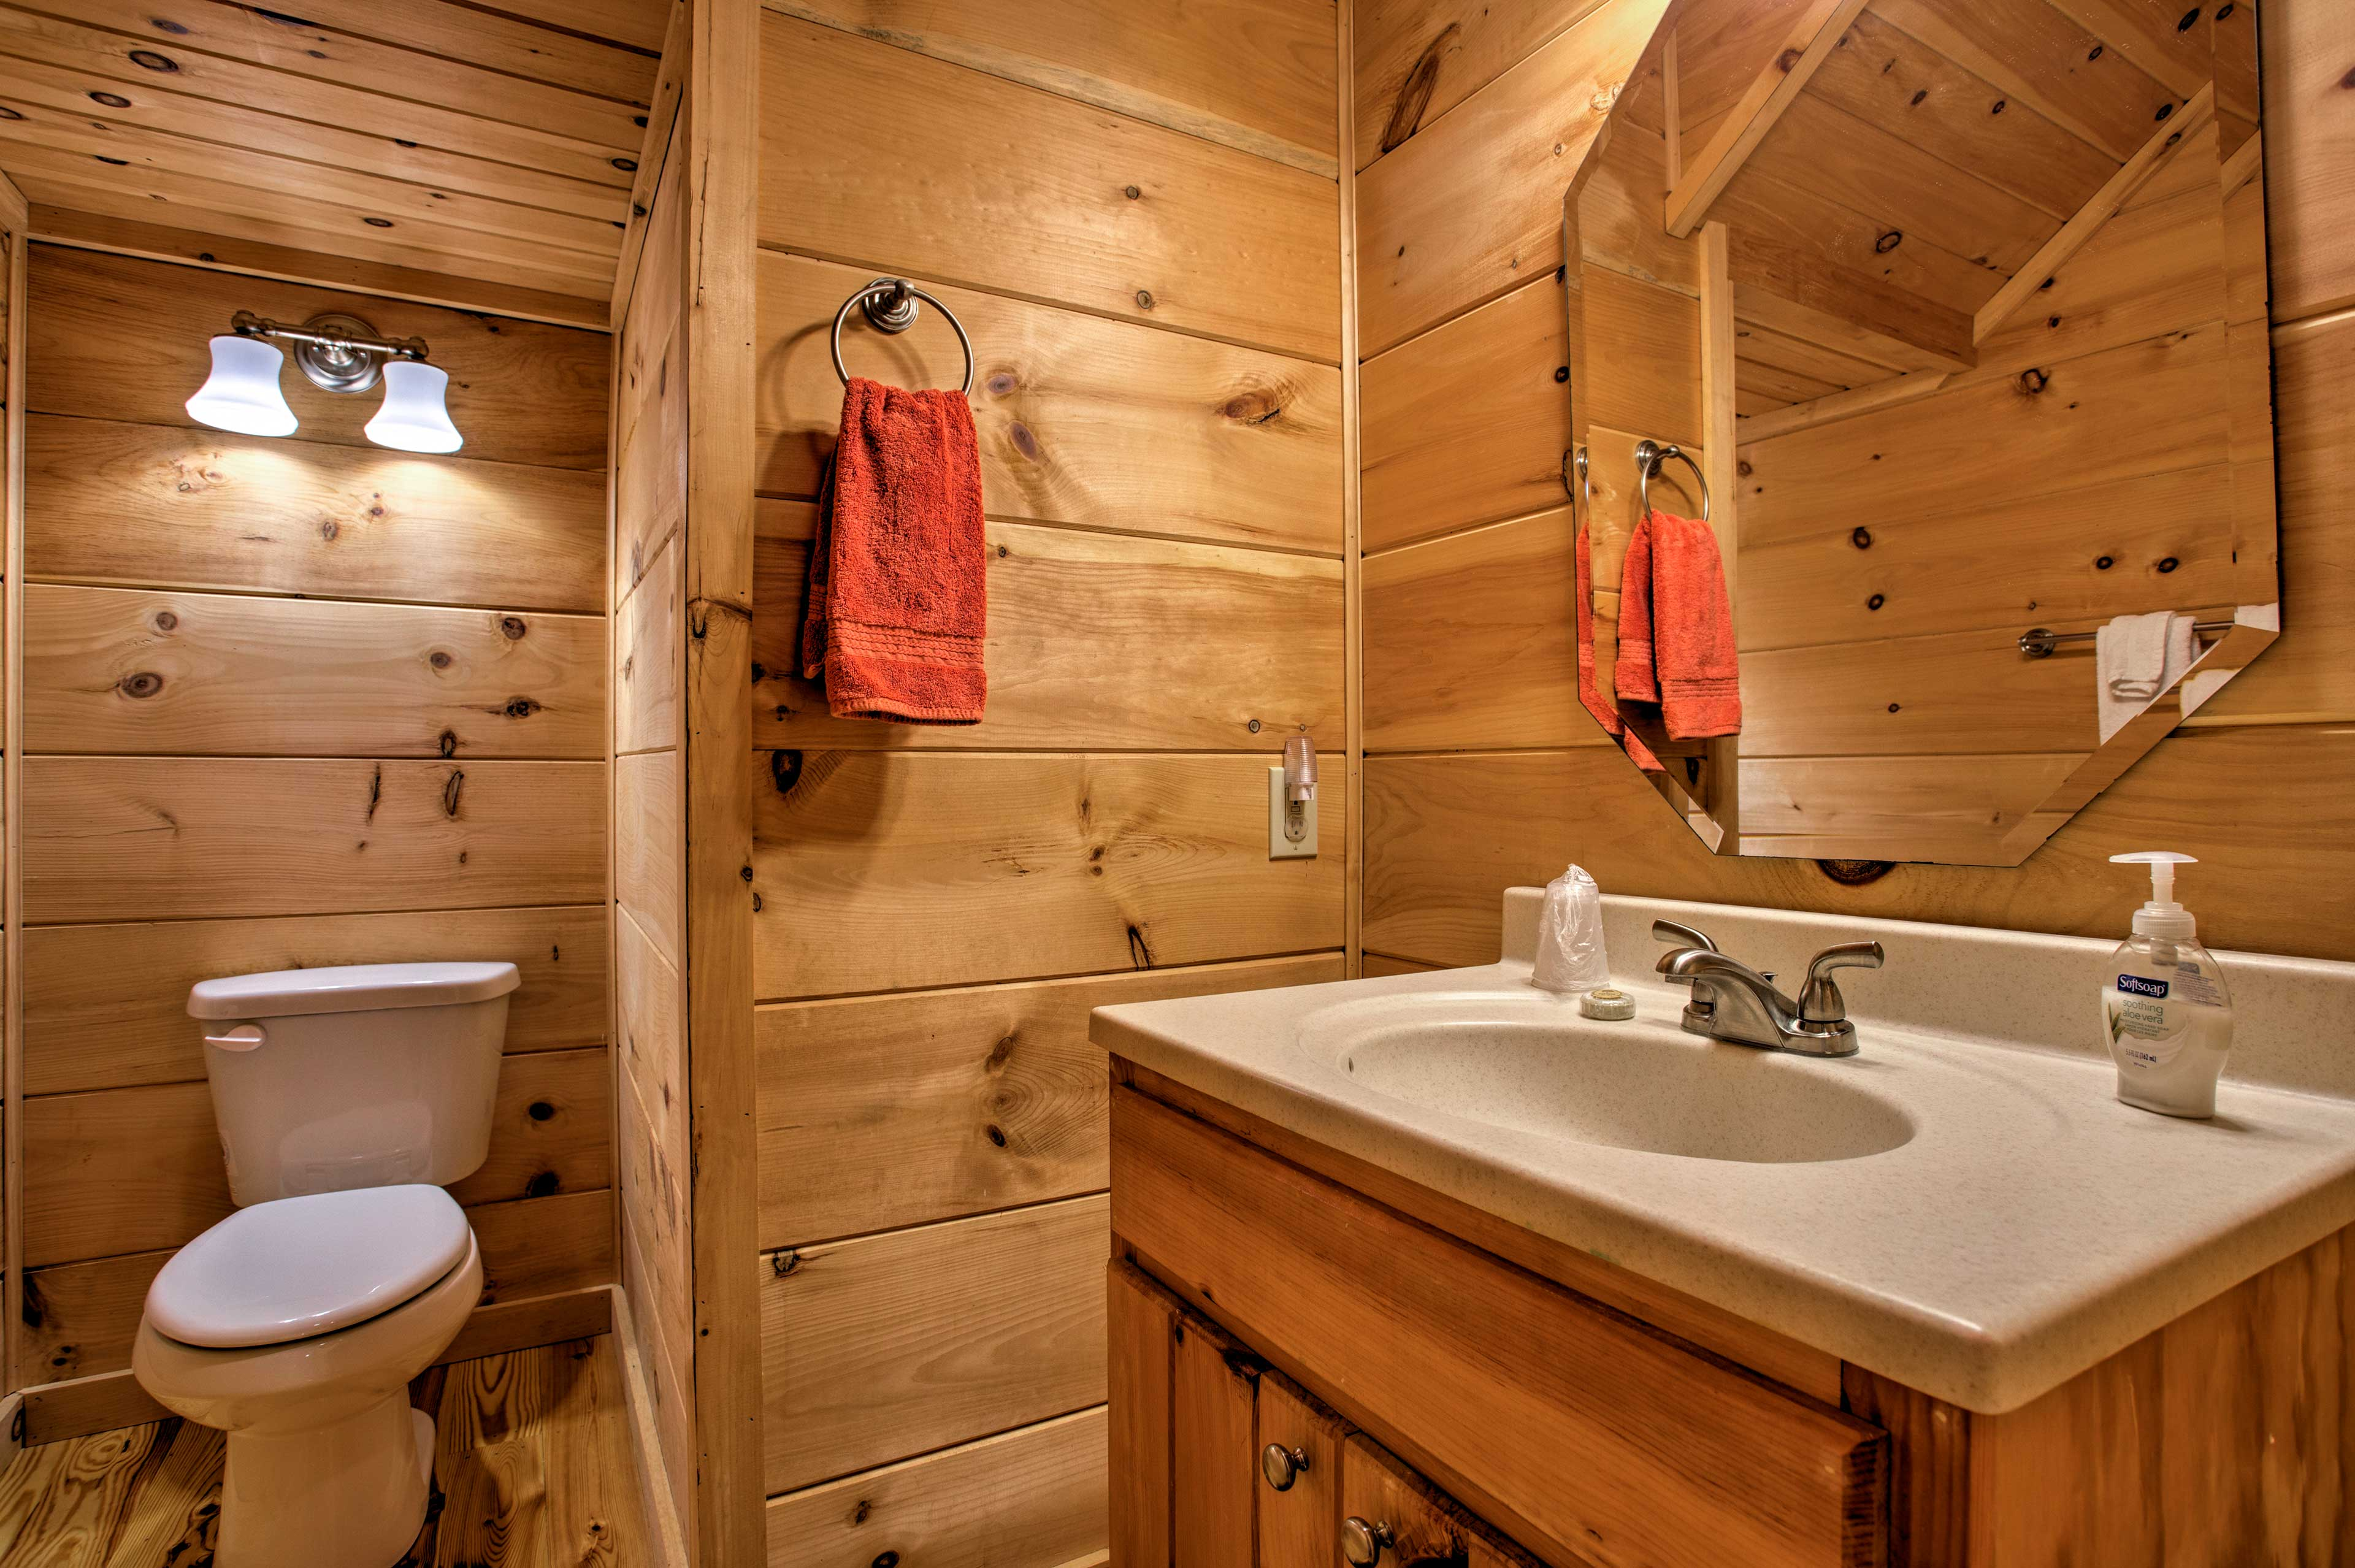 This home has 4 full baths and 2 half baths.